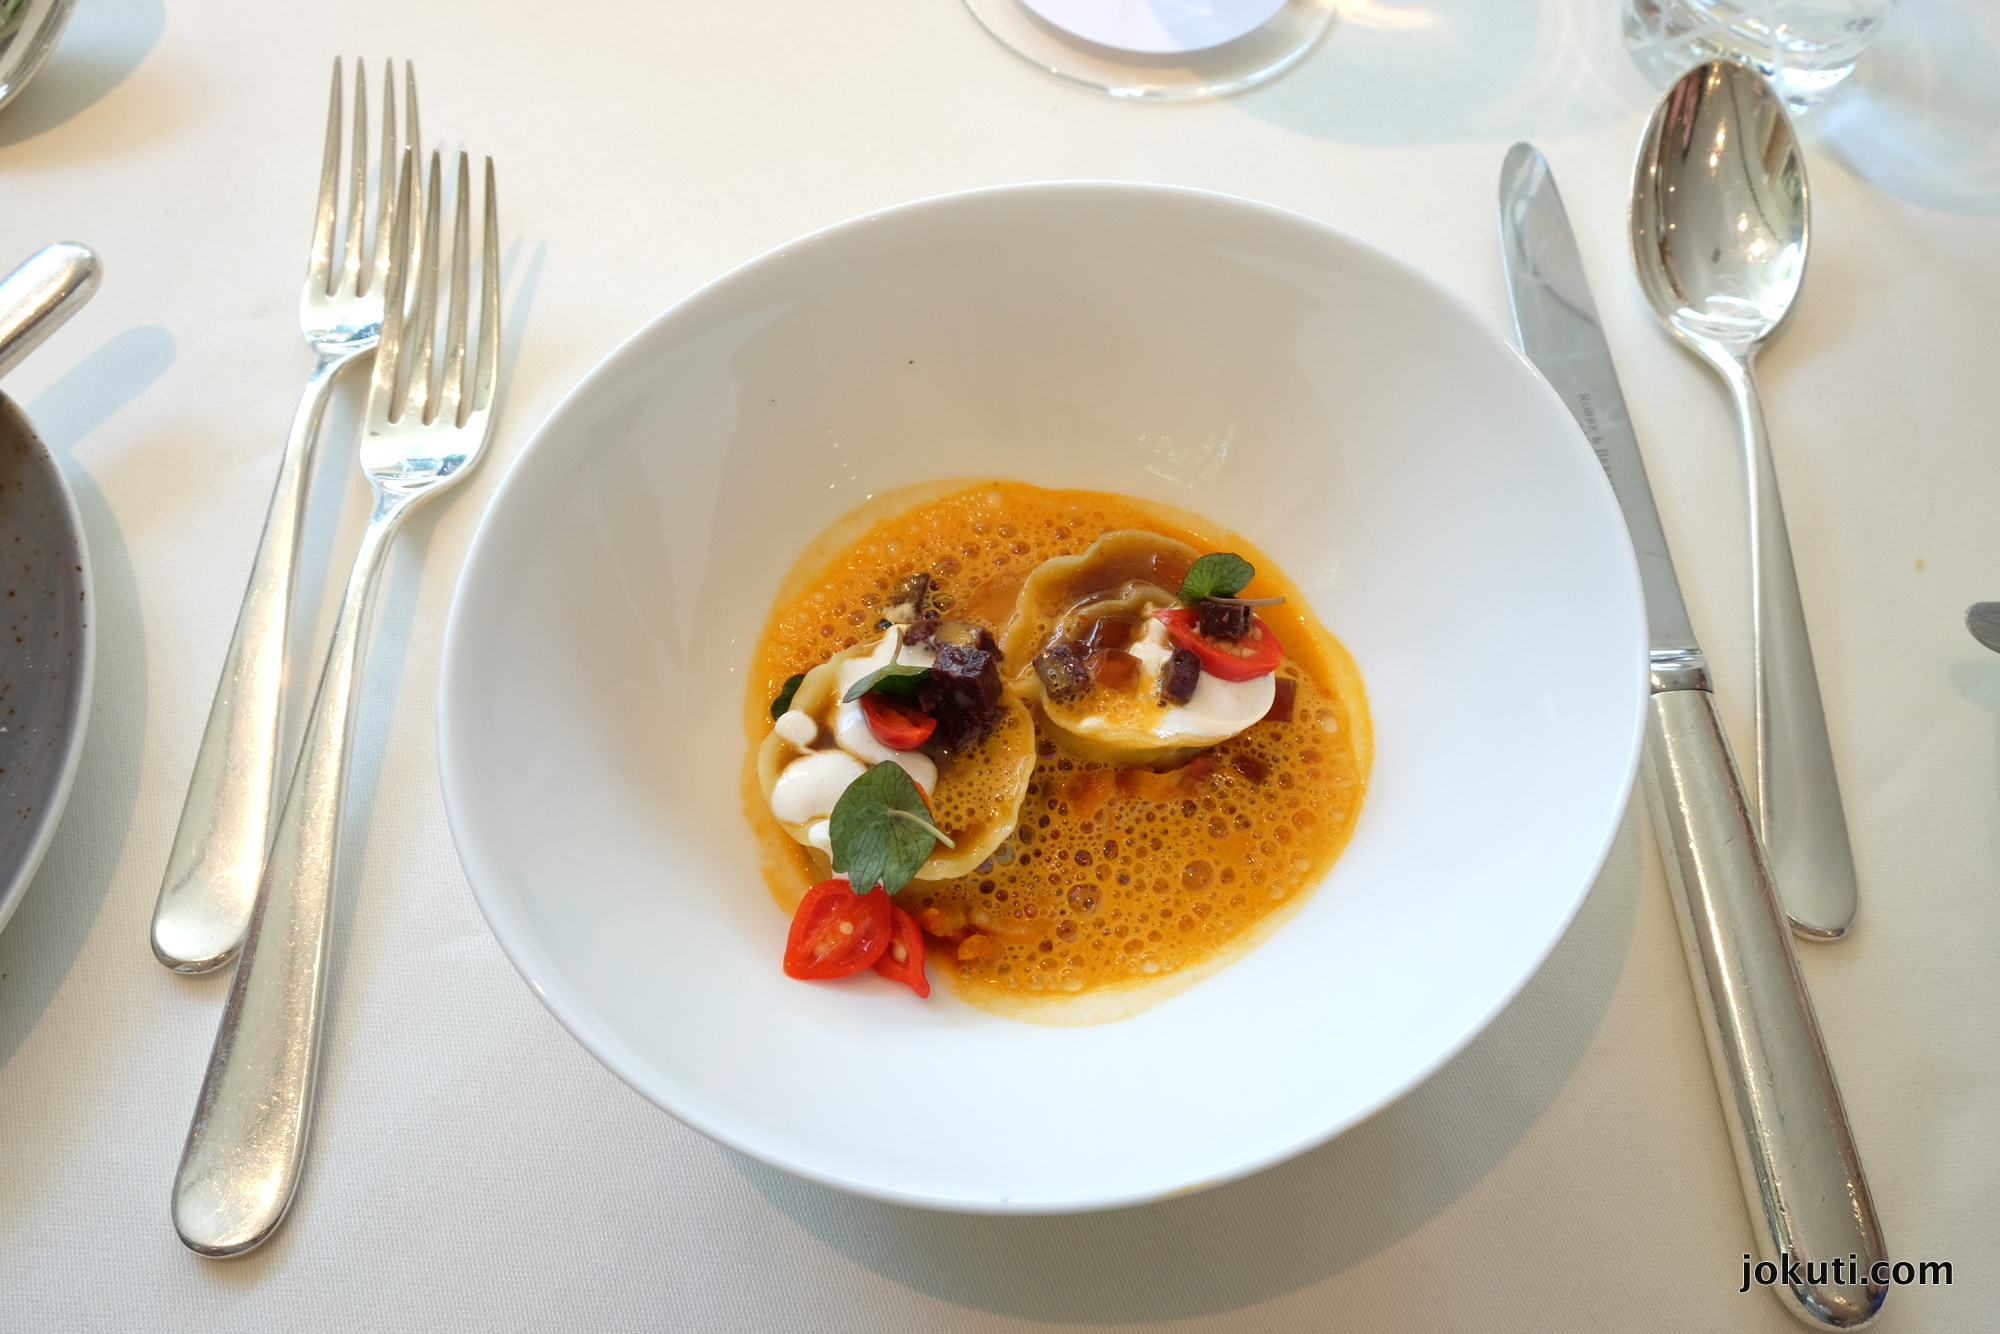 dscf7671_ausztria_austria_vilagevo_jokuti_landhaus_bacher_dorfer_mautern_wachau_reitbauer_restaurant.jpg